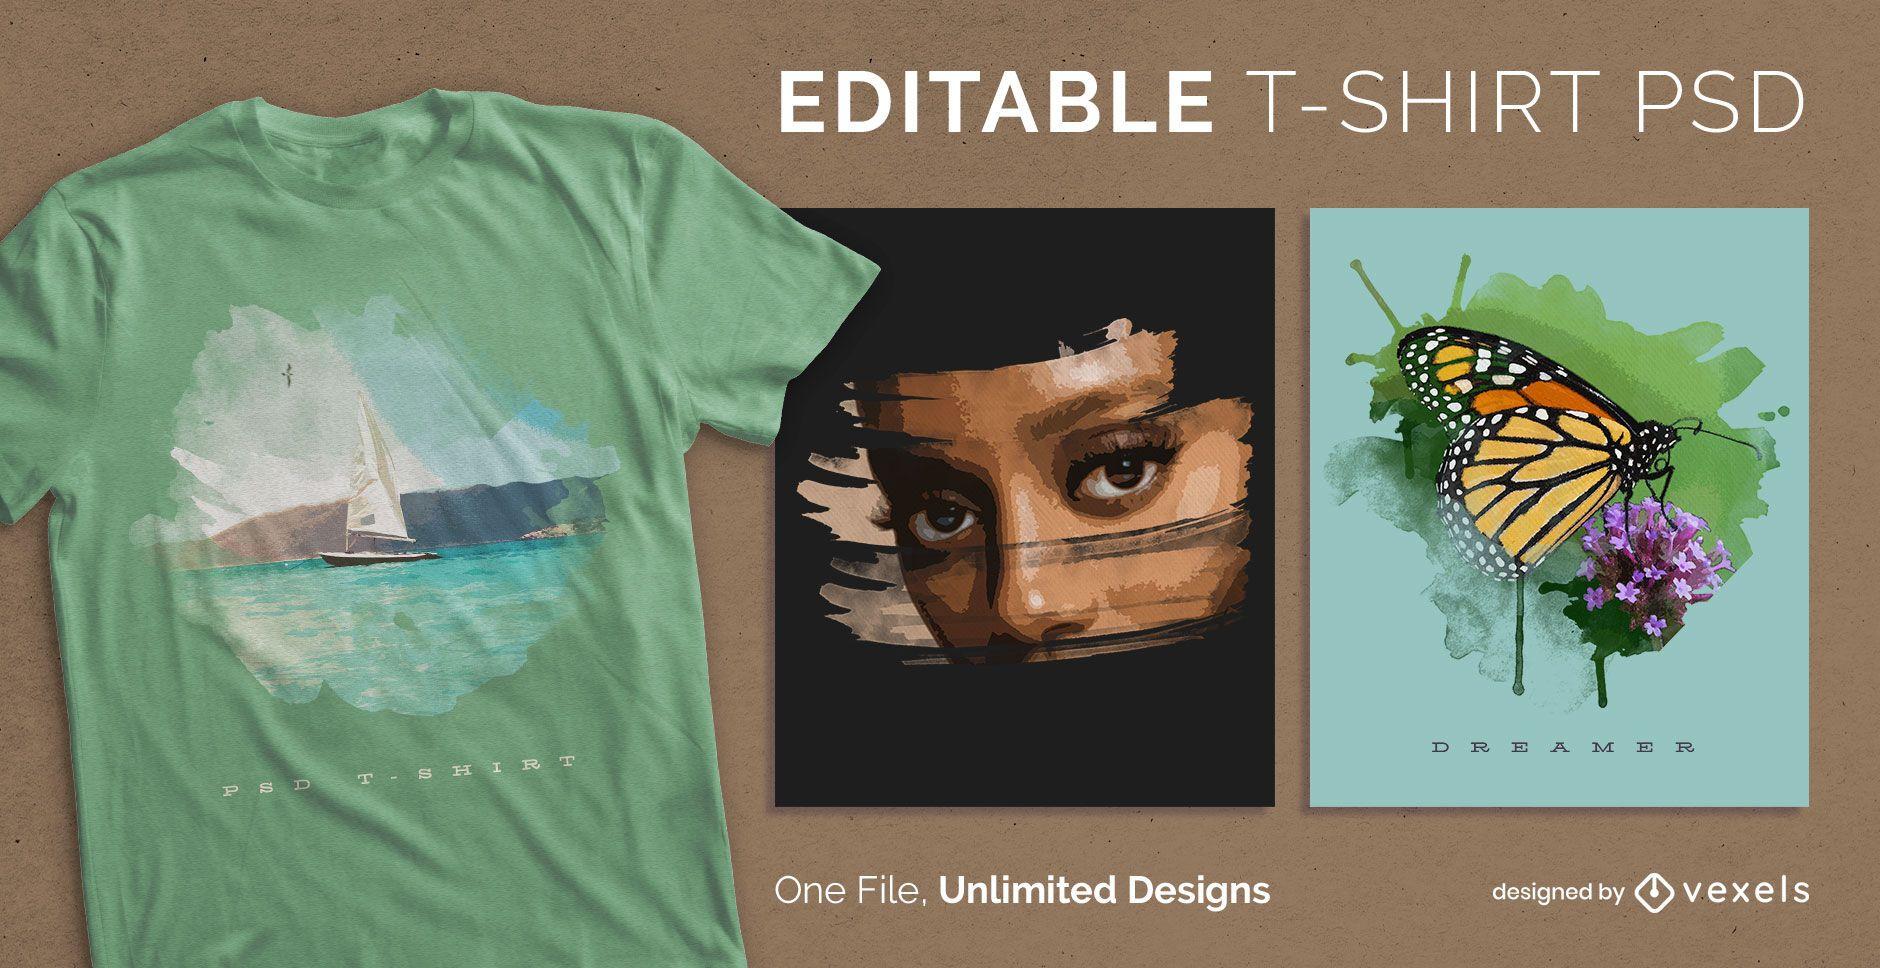 Watercolor art scalable t-shirt psd